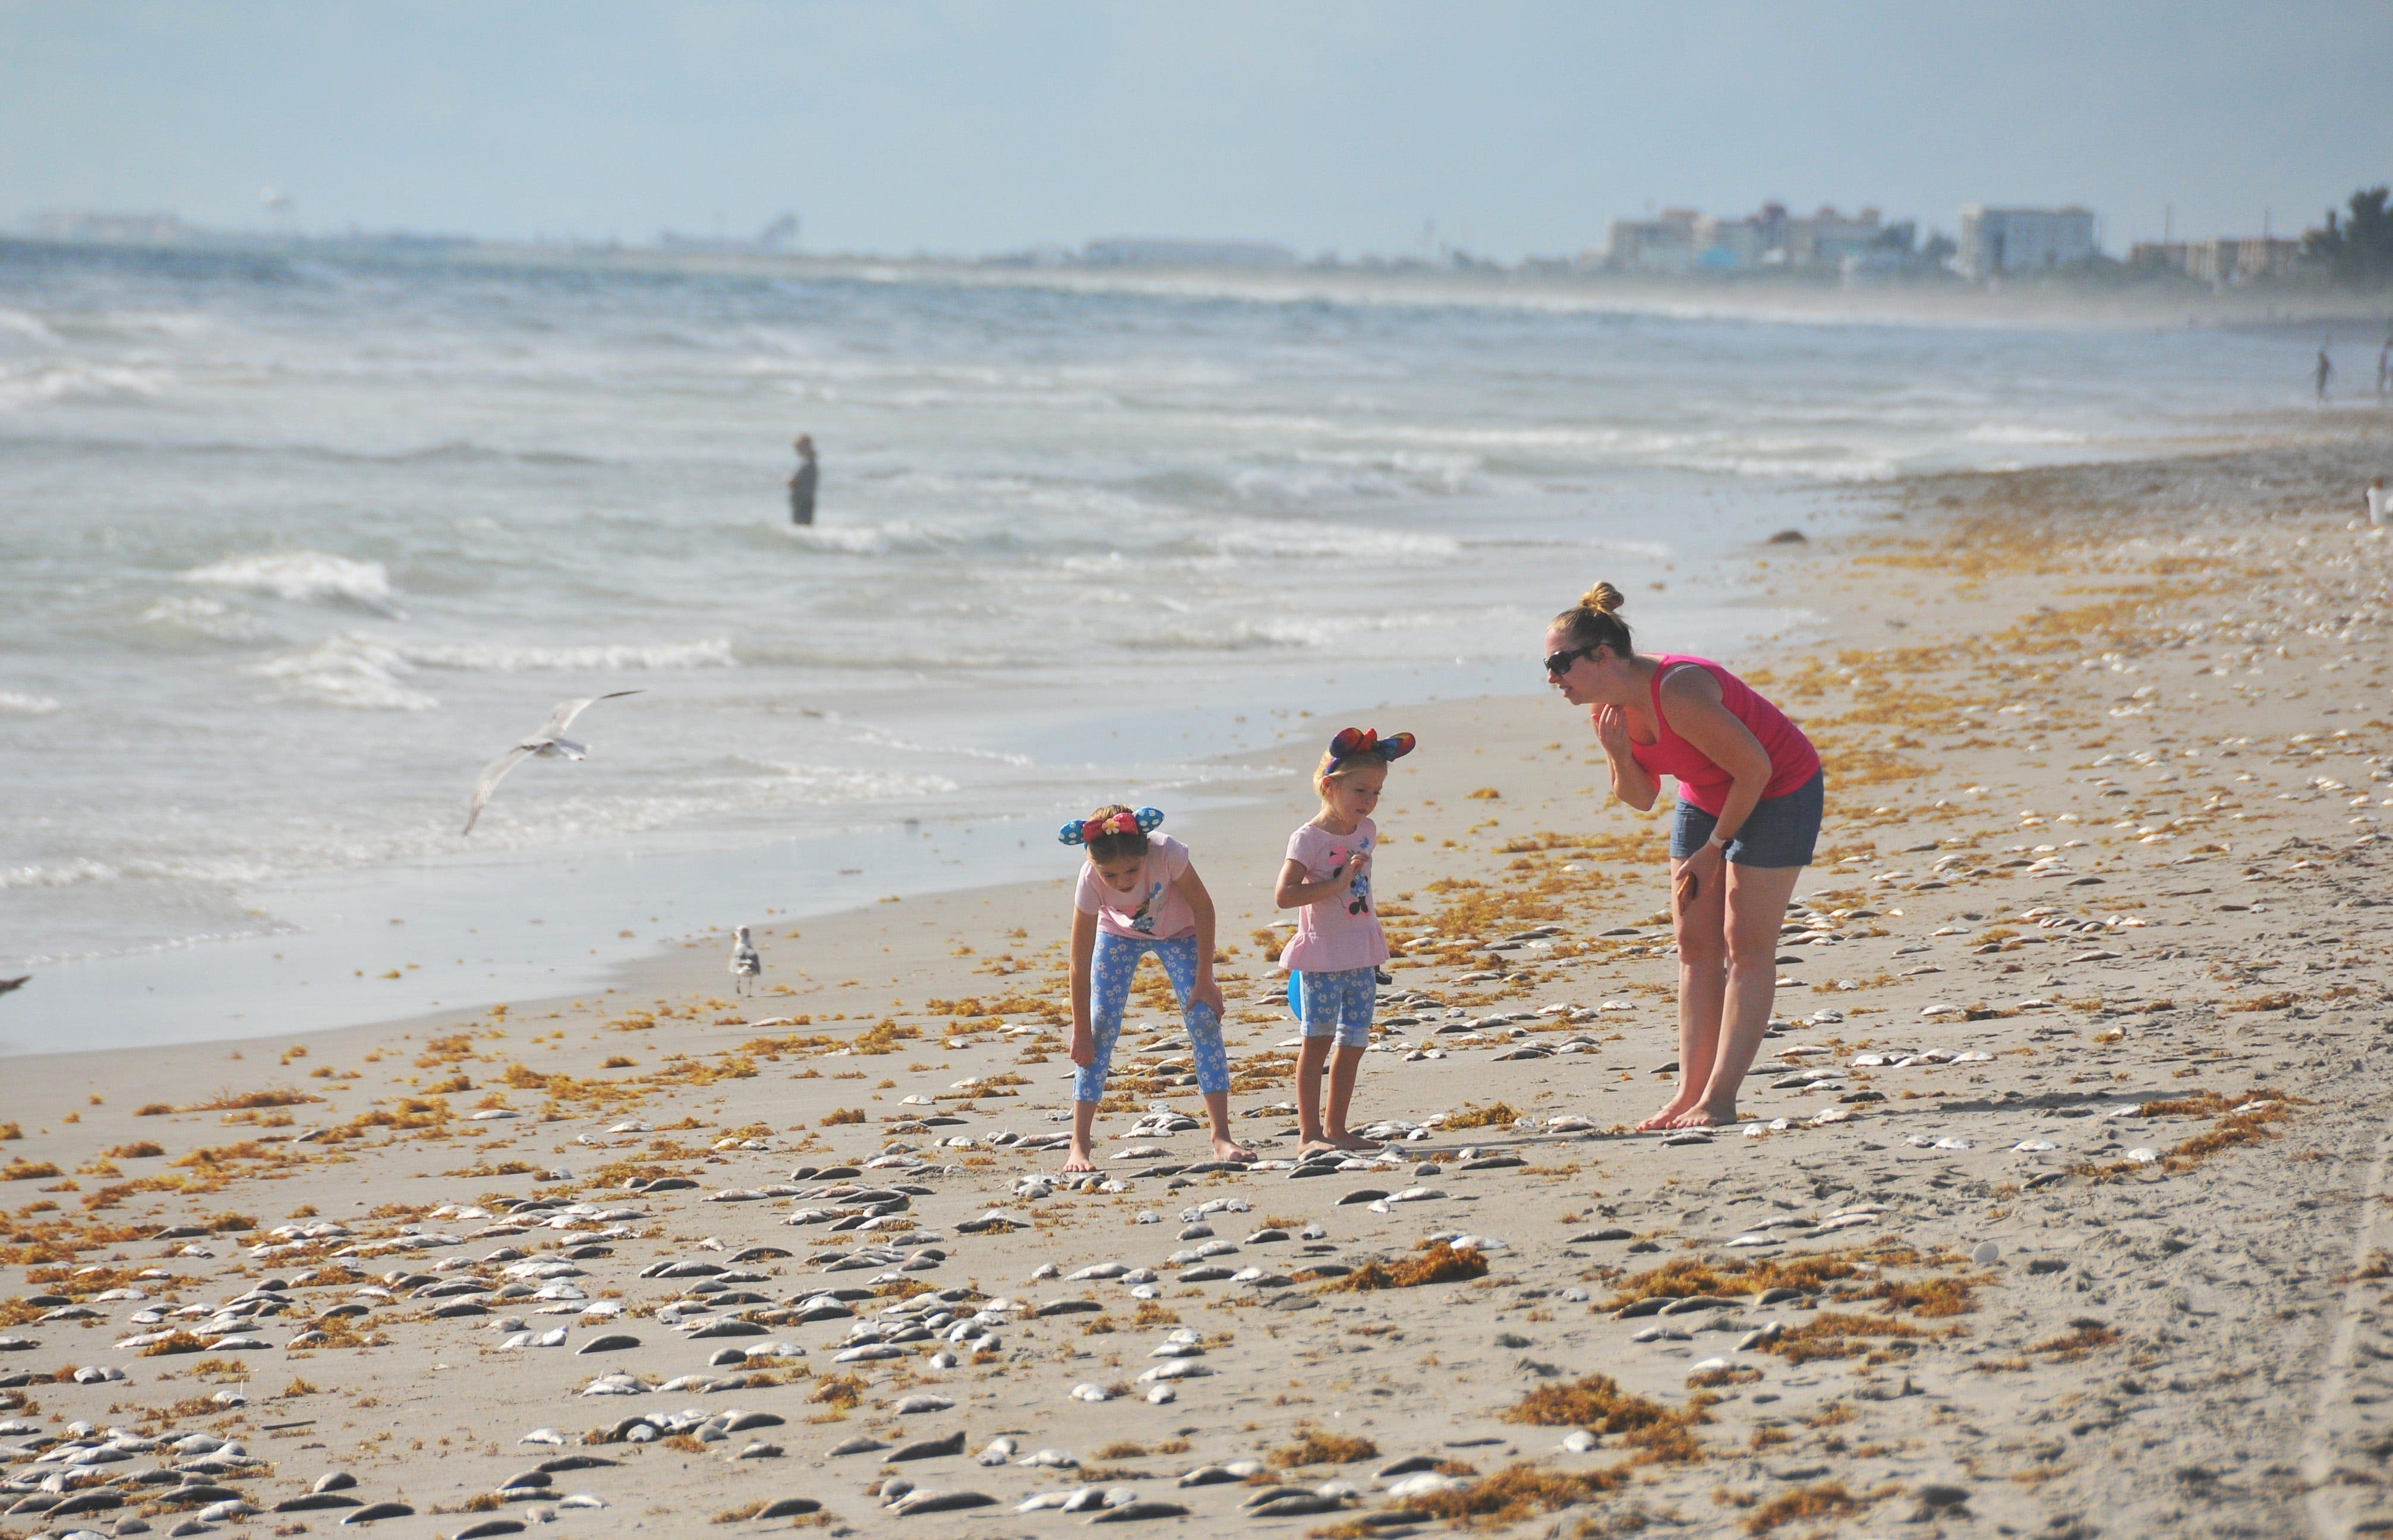 Imgenes De Tides In Cocoa Beach Florida